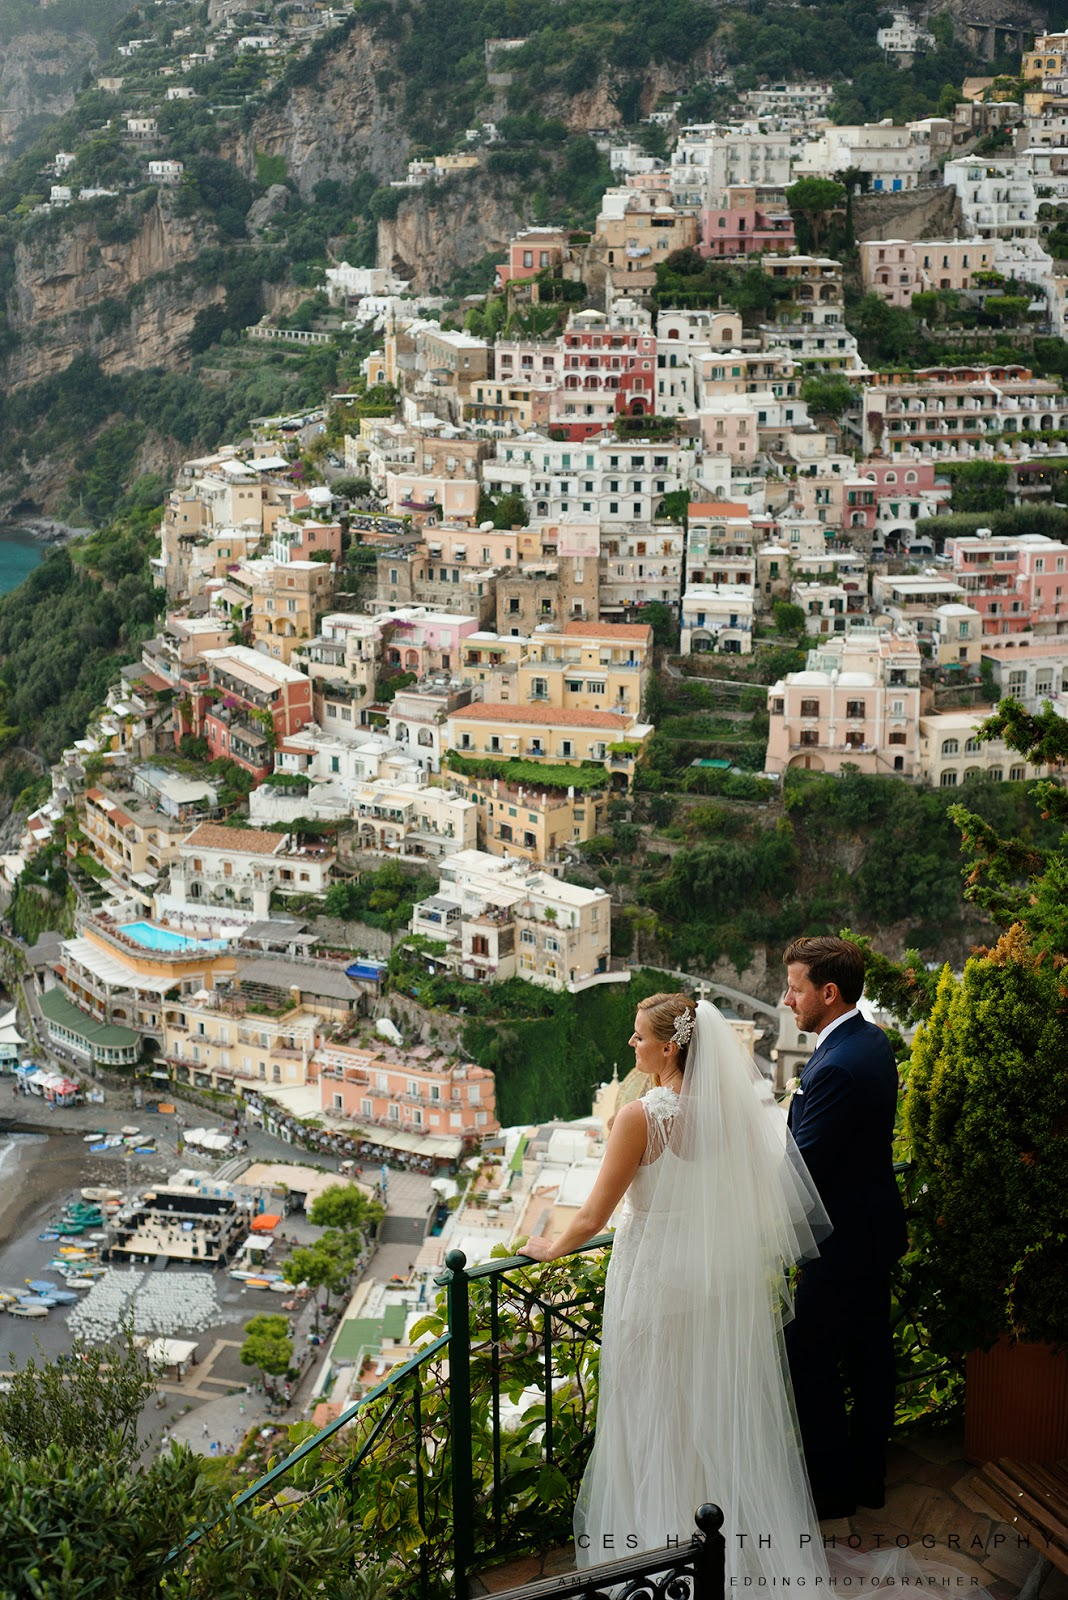 Wedding portrait at Villa Oliviero in Positano